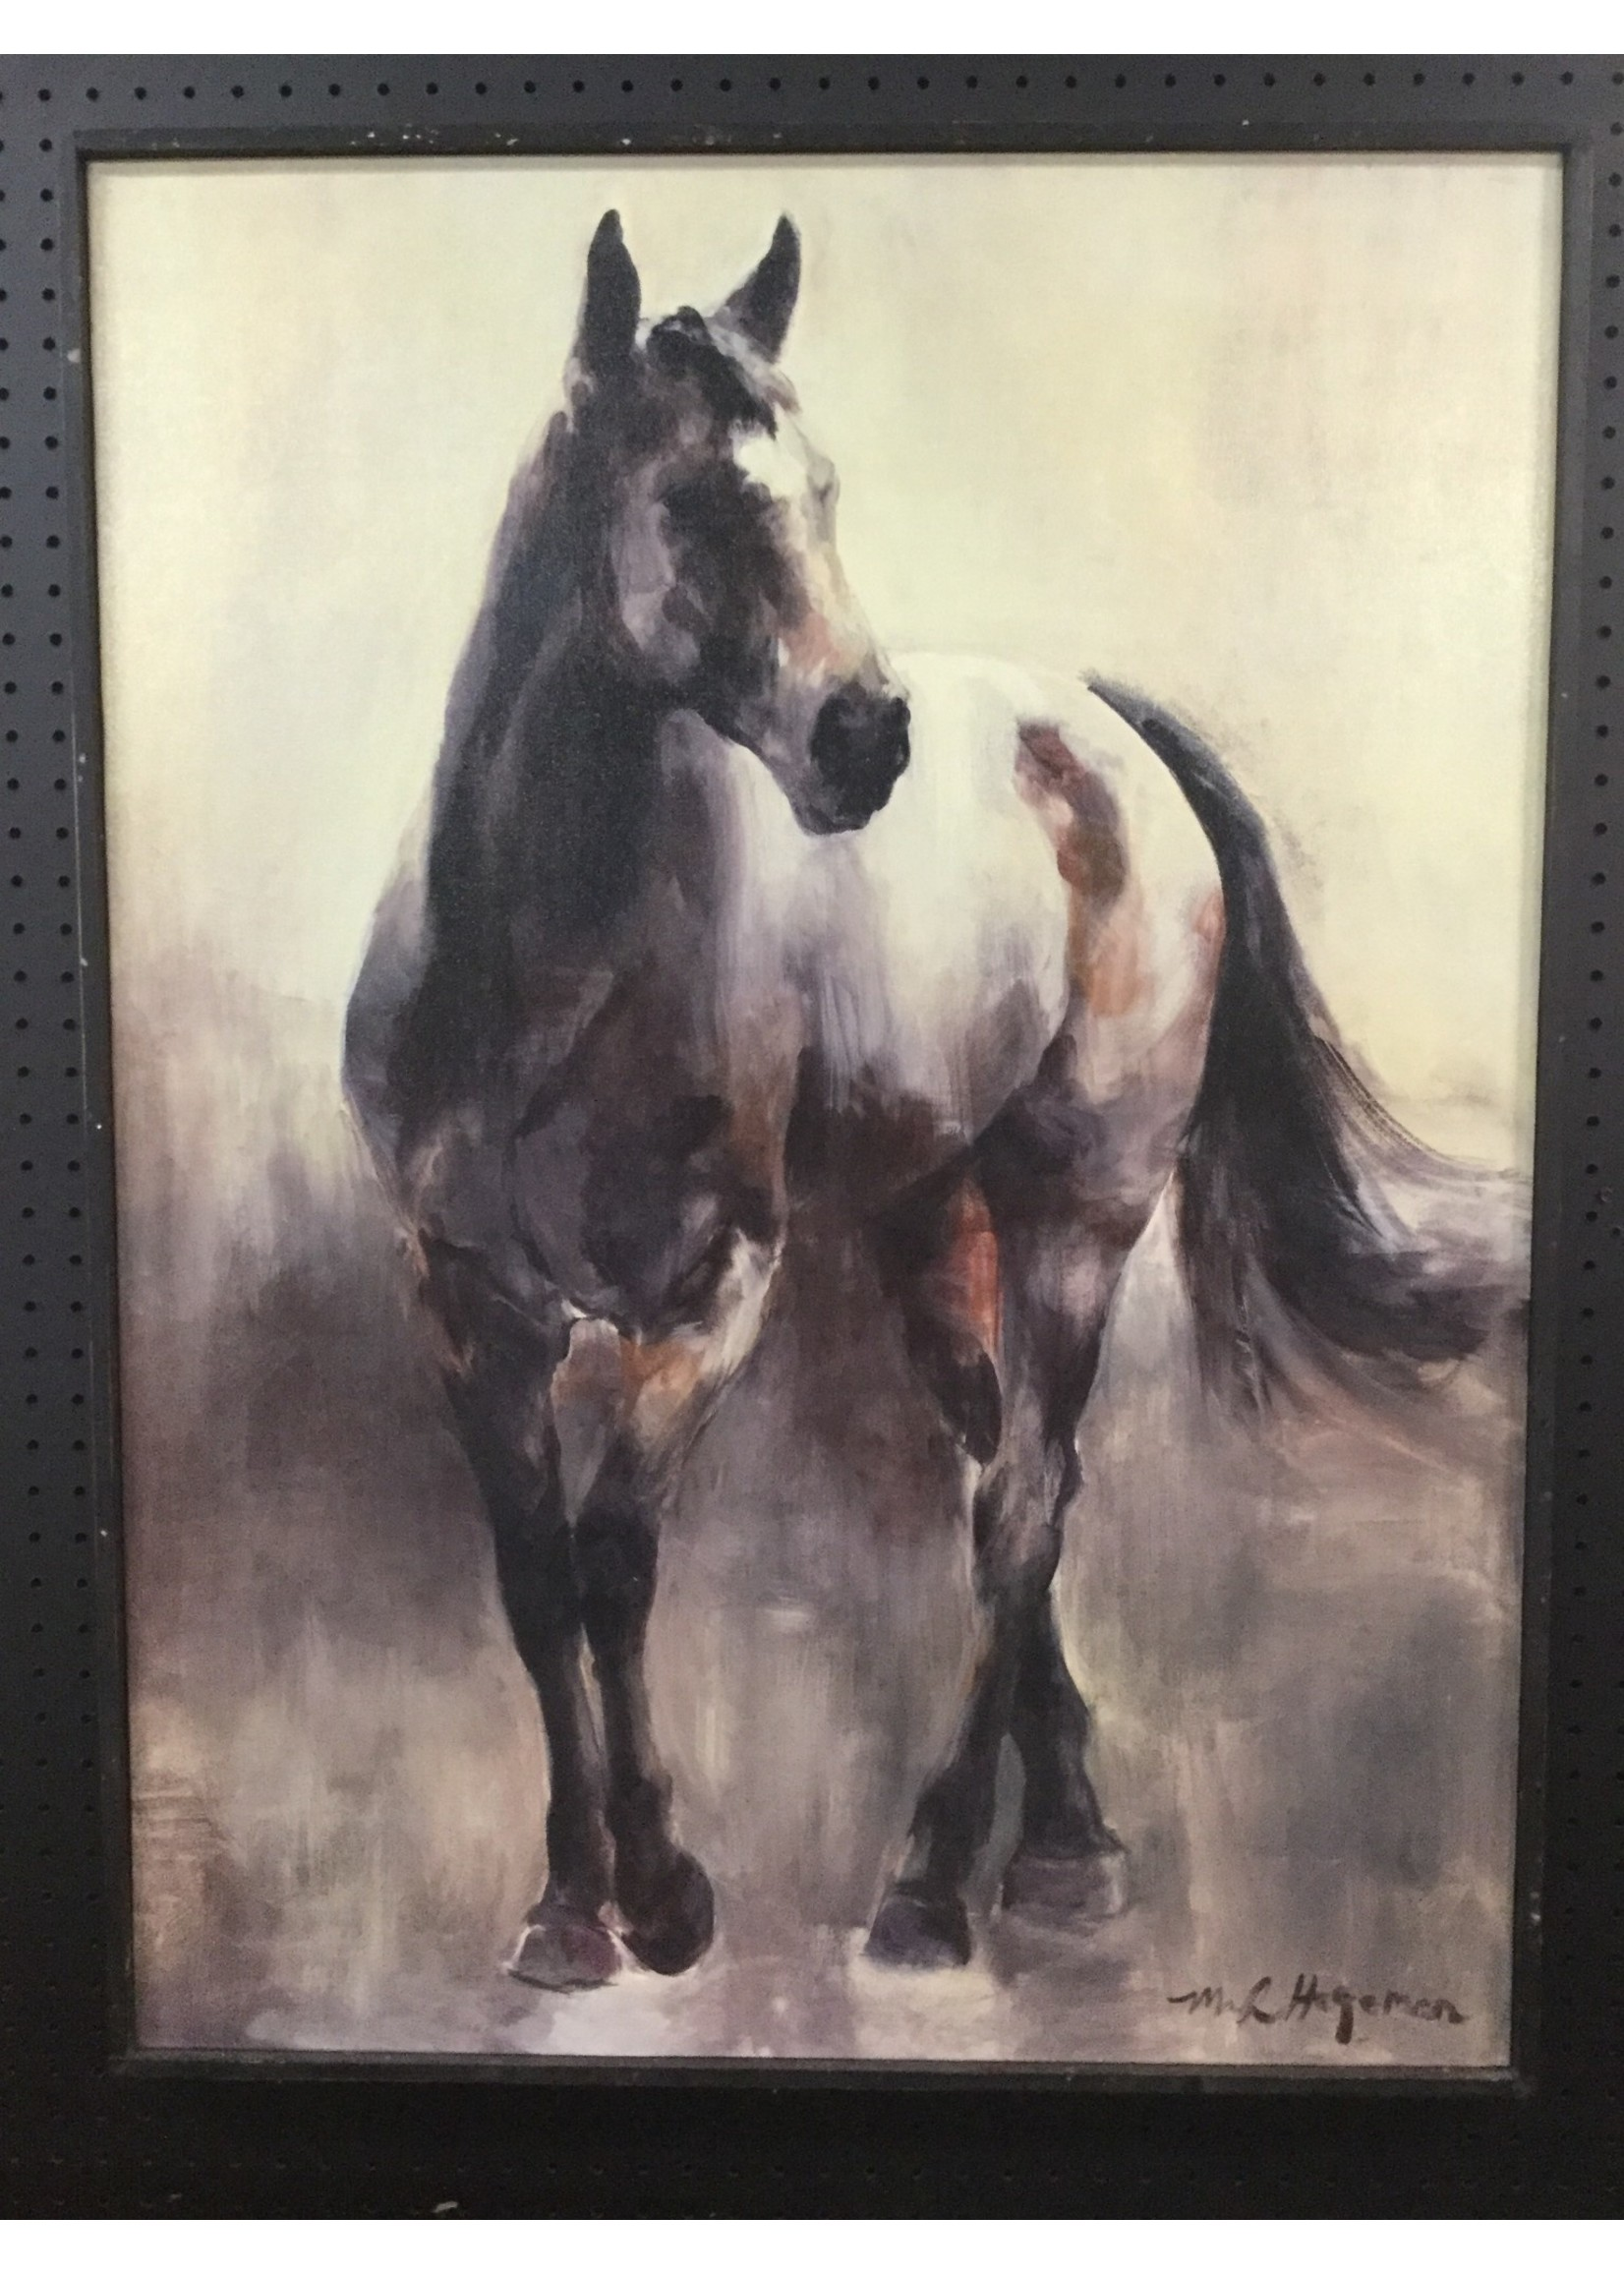 CREATIVE CO-OP DA7696 WALL  ART CANVAS HORSE